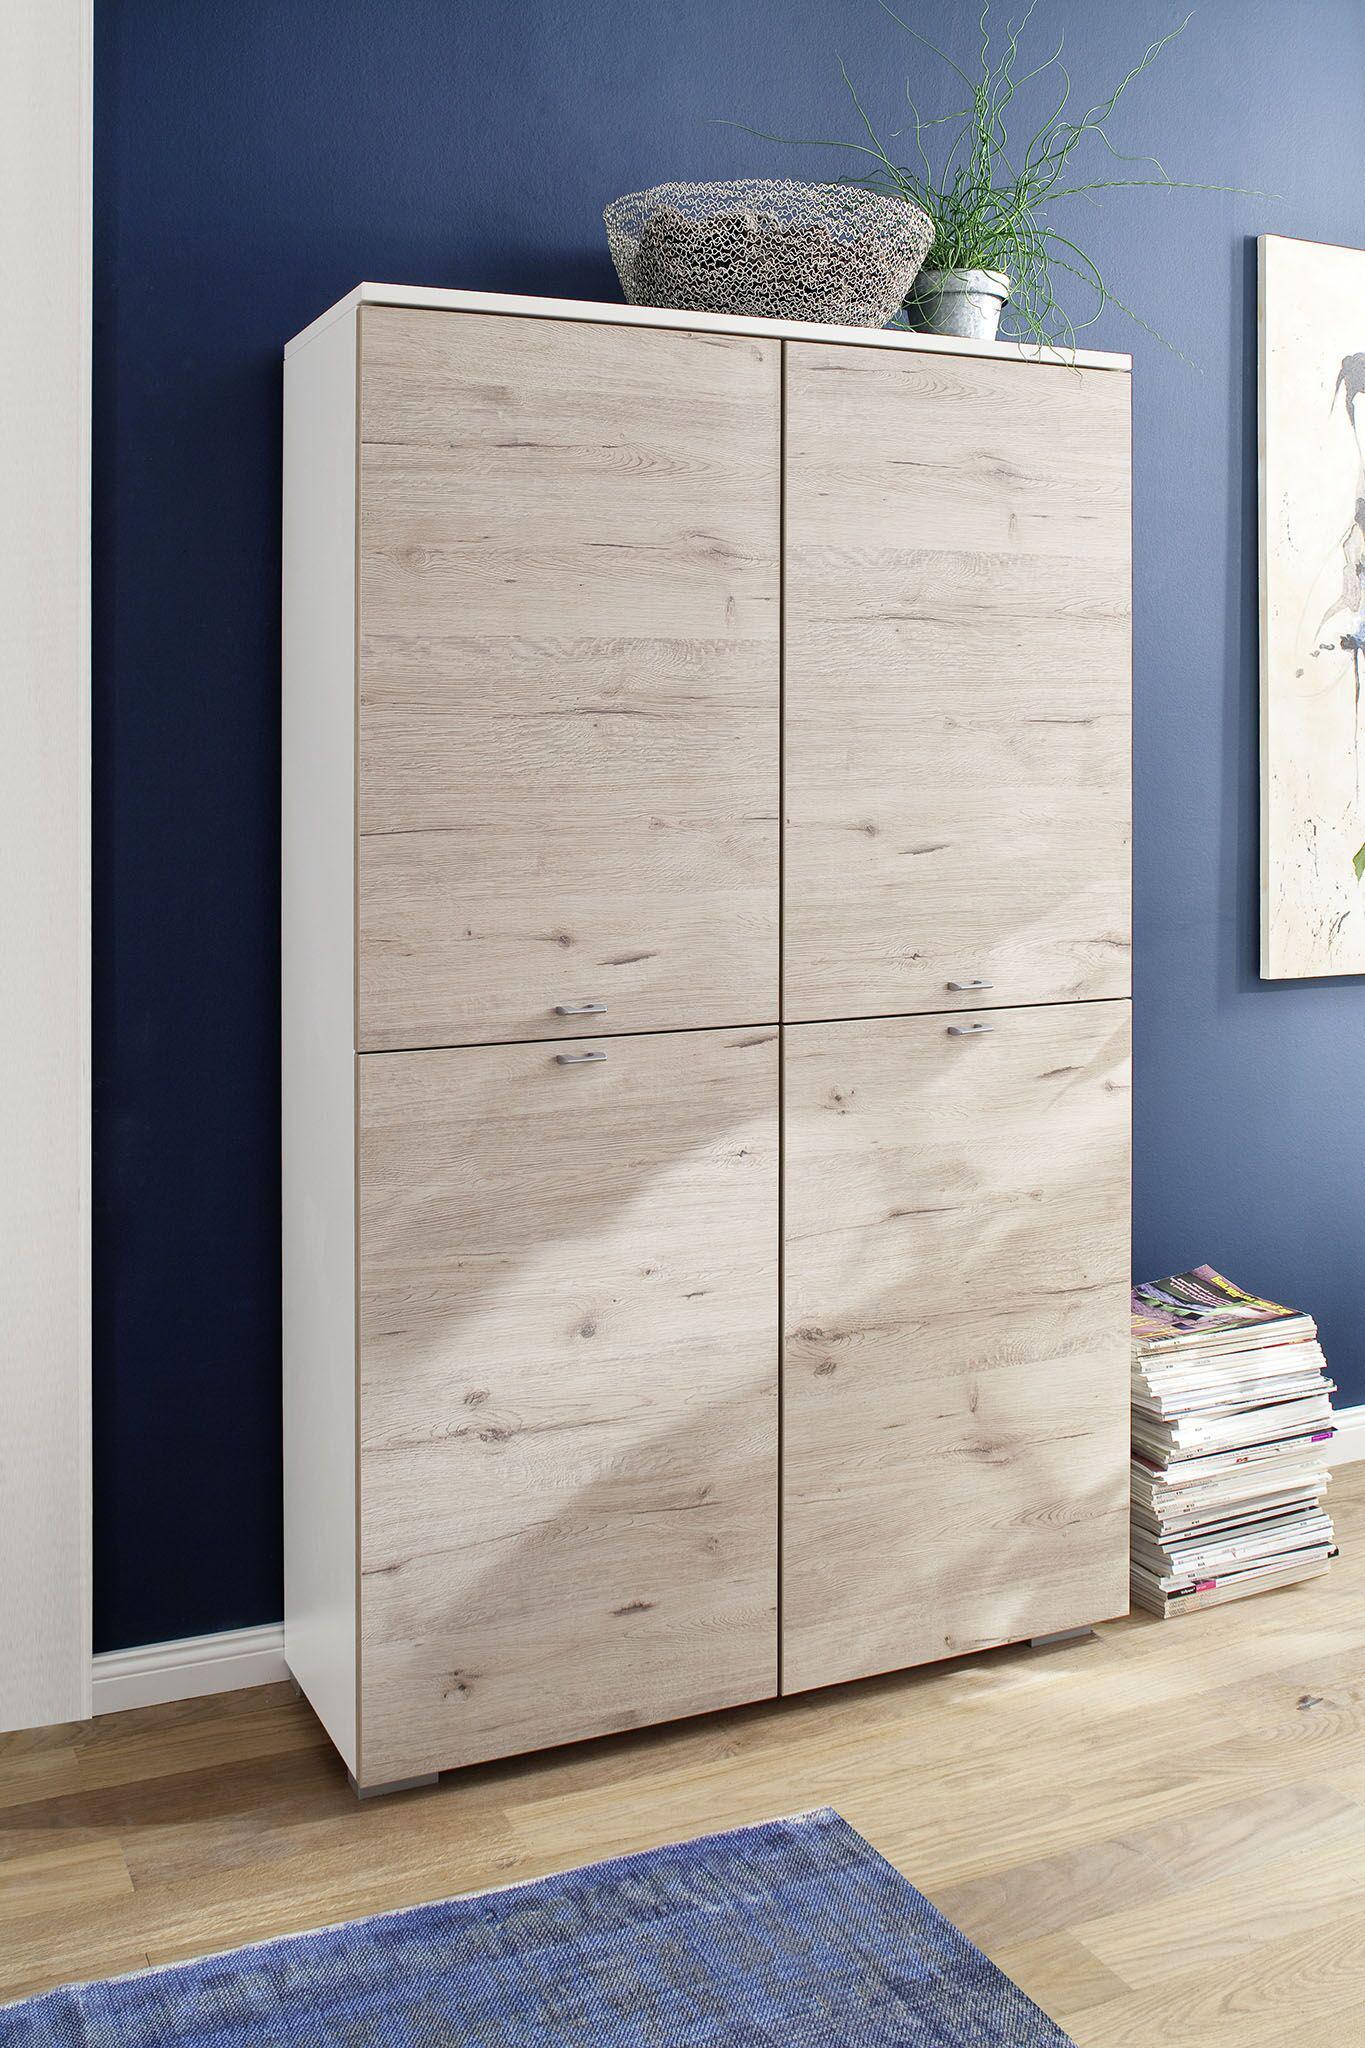 Korpus Schrank Ikea Unterschrank 50 Cm